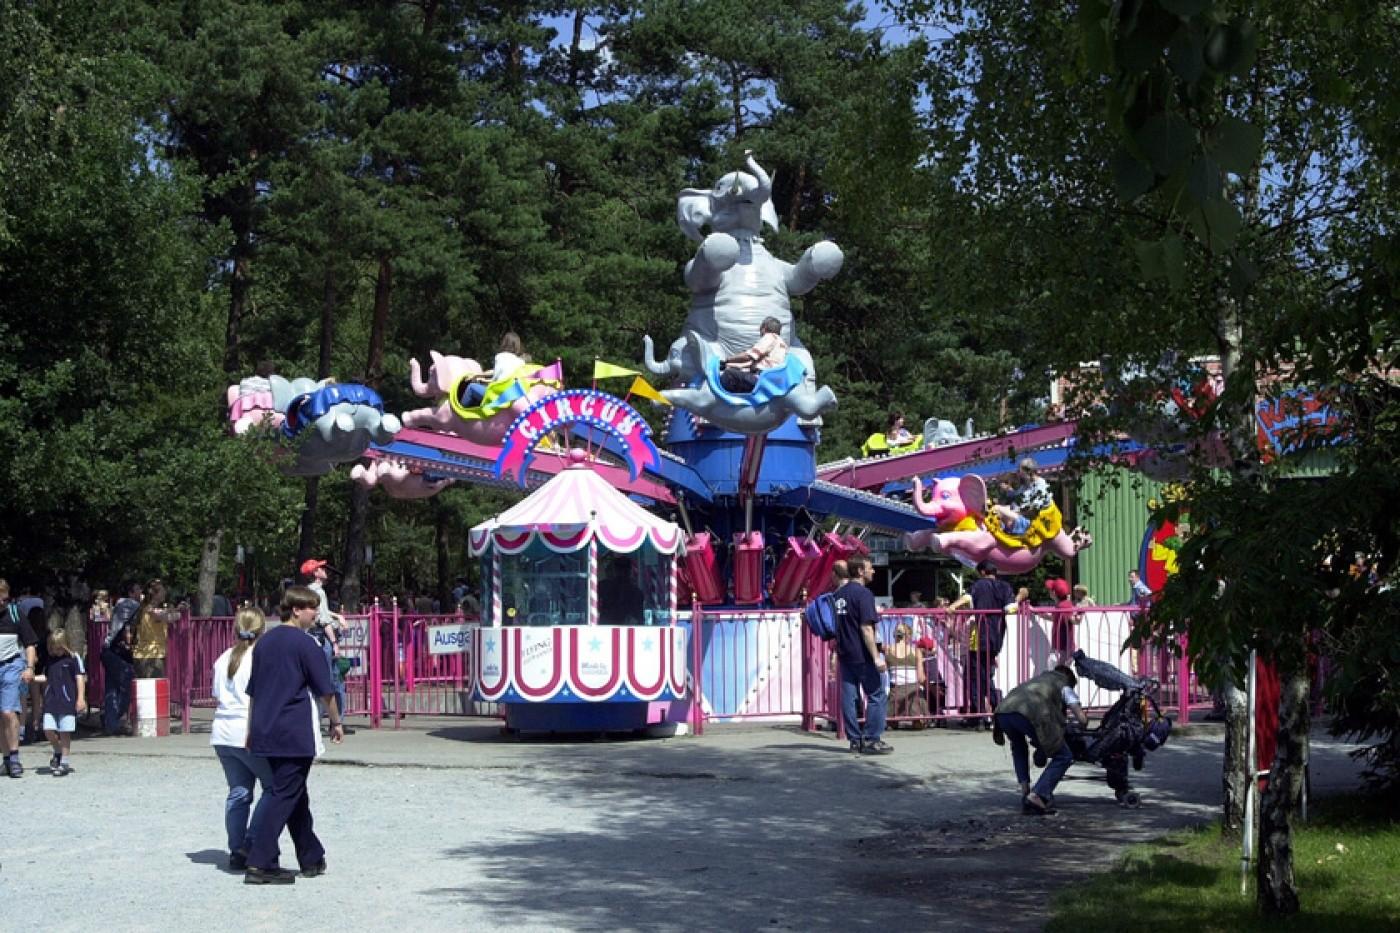 Flying-Elefant